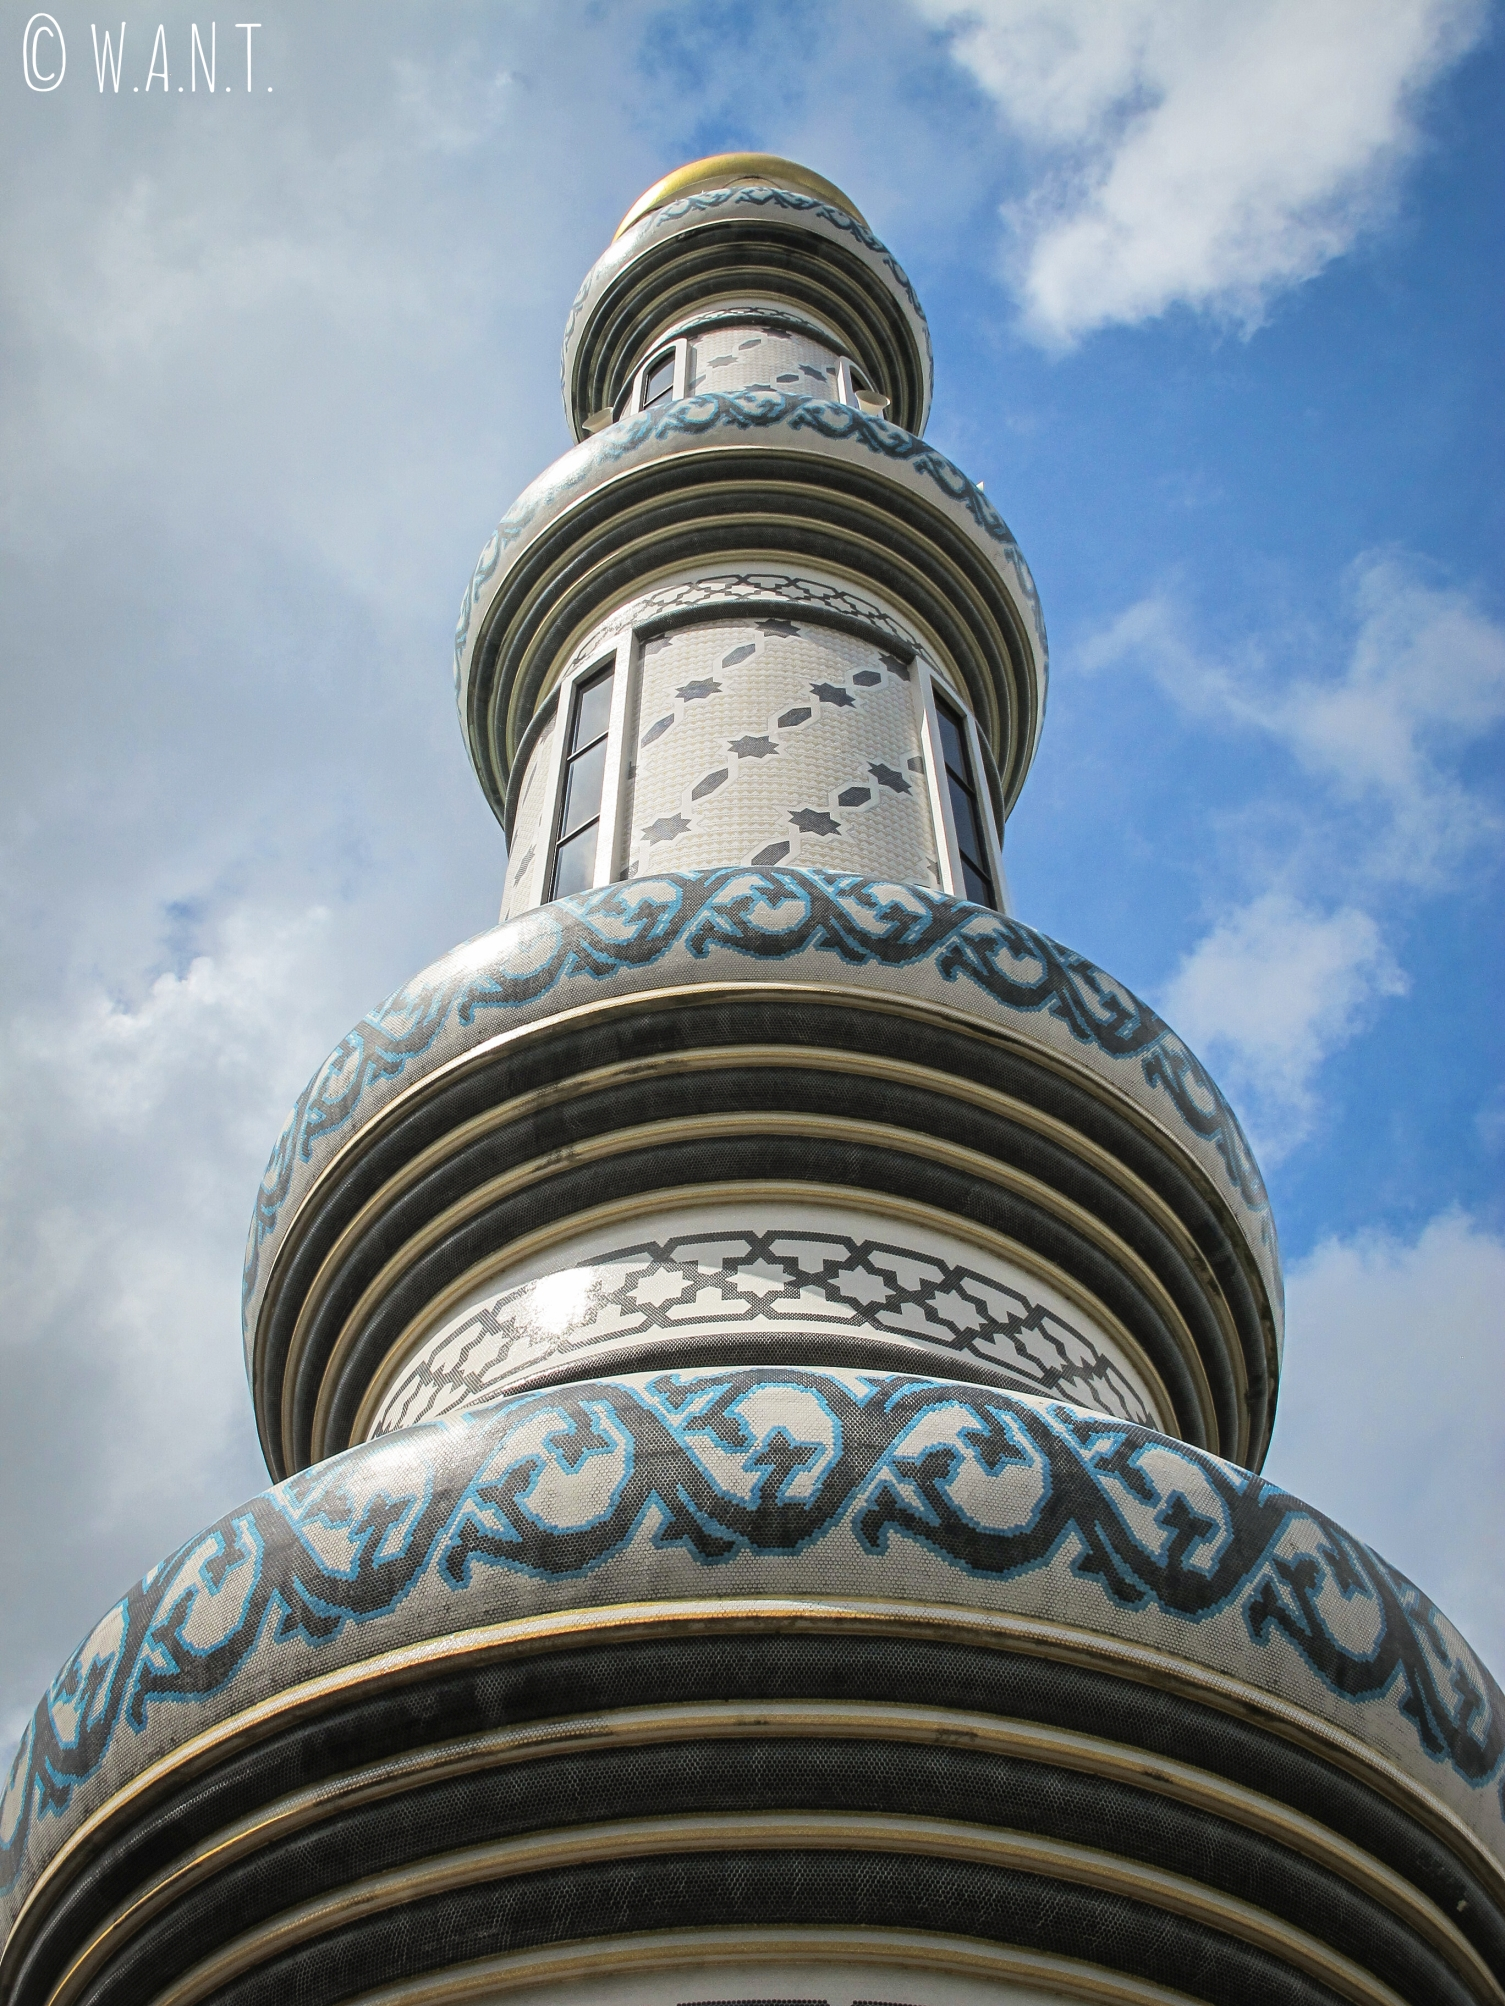 Minaret de la mosquée Masjid Jame'Asr Hassanil Bolkiah de Bandar Seri Begawan